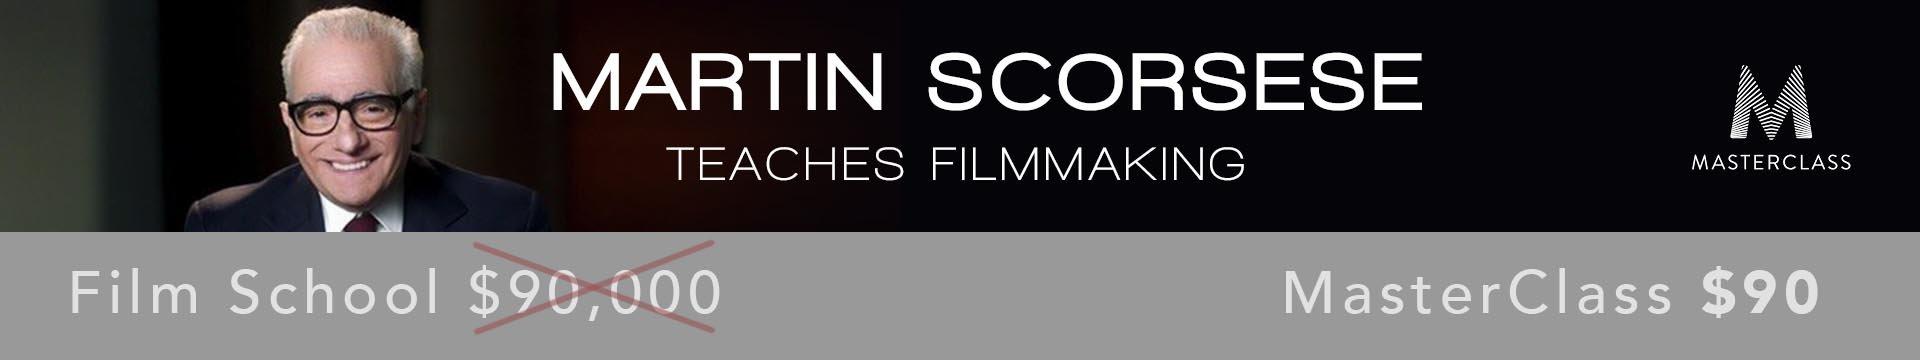 Master Class Banner Scorsese